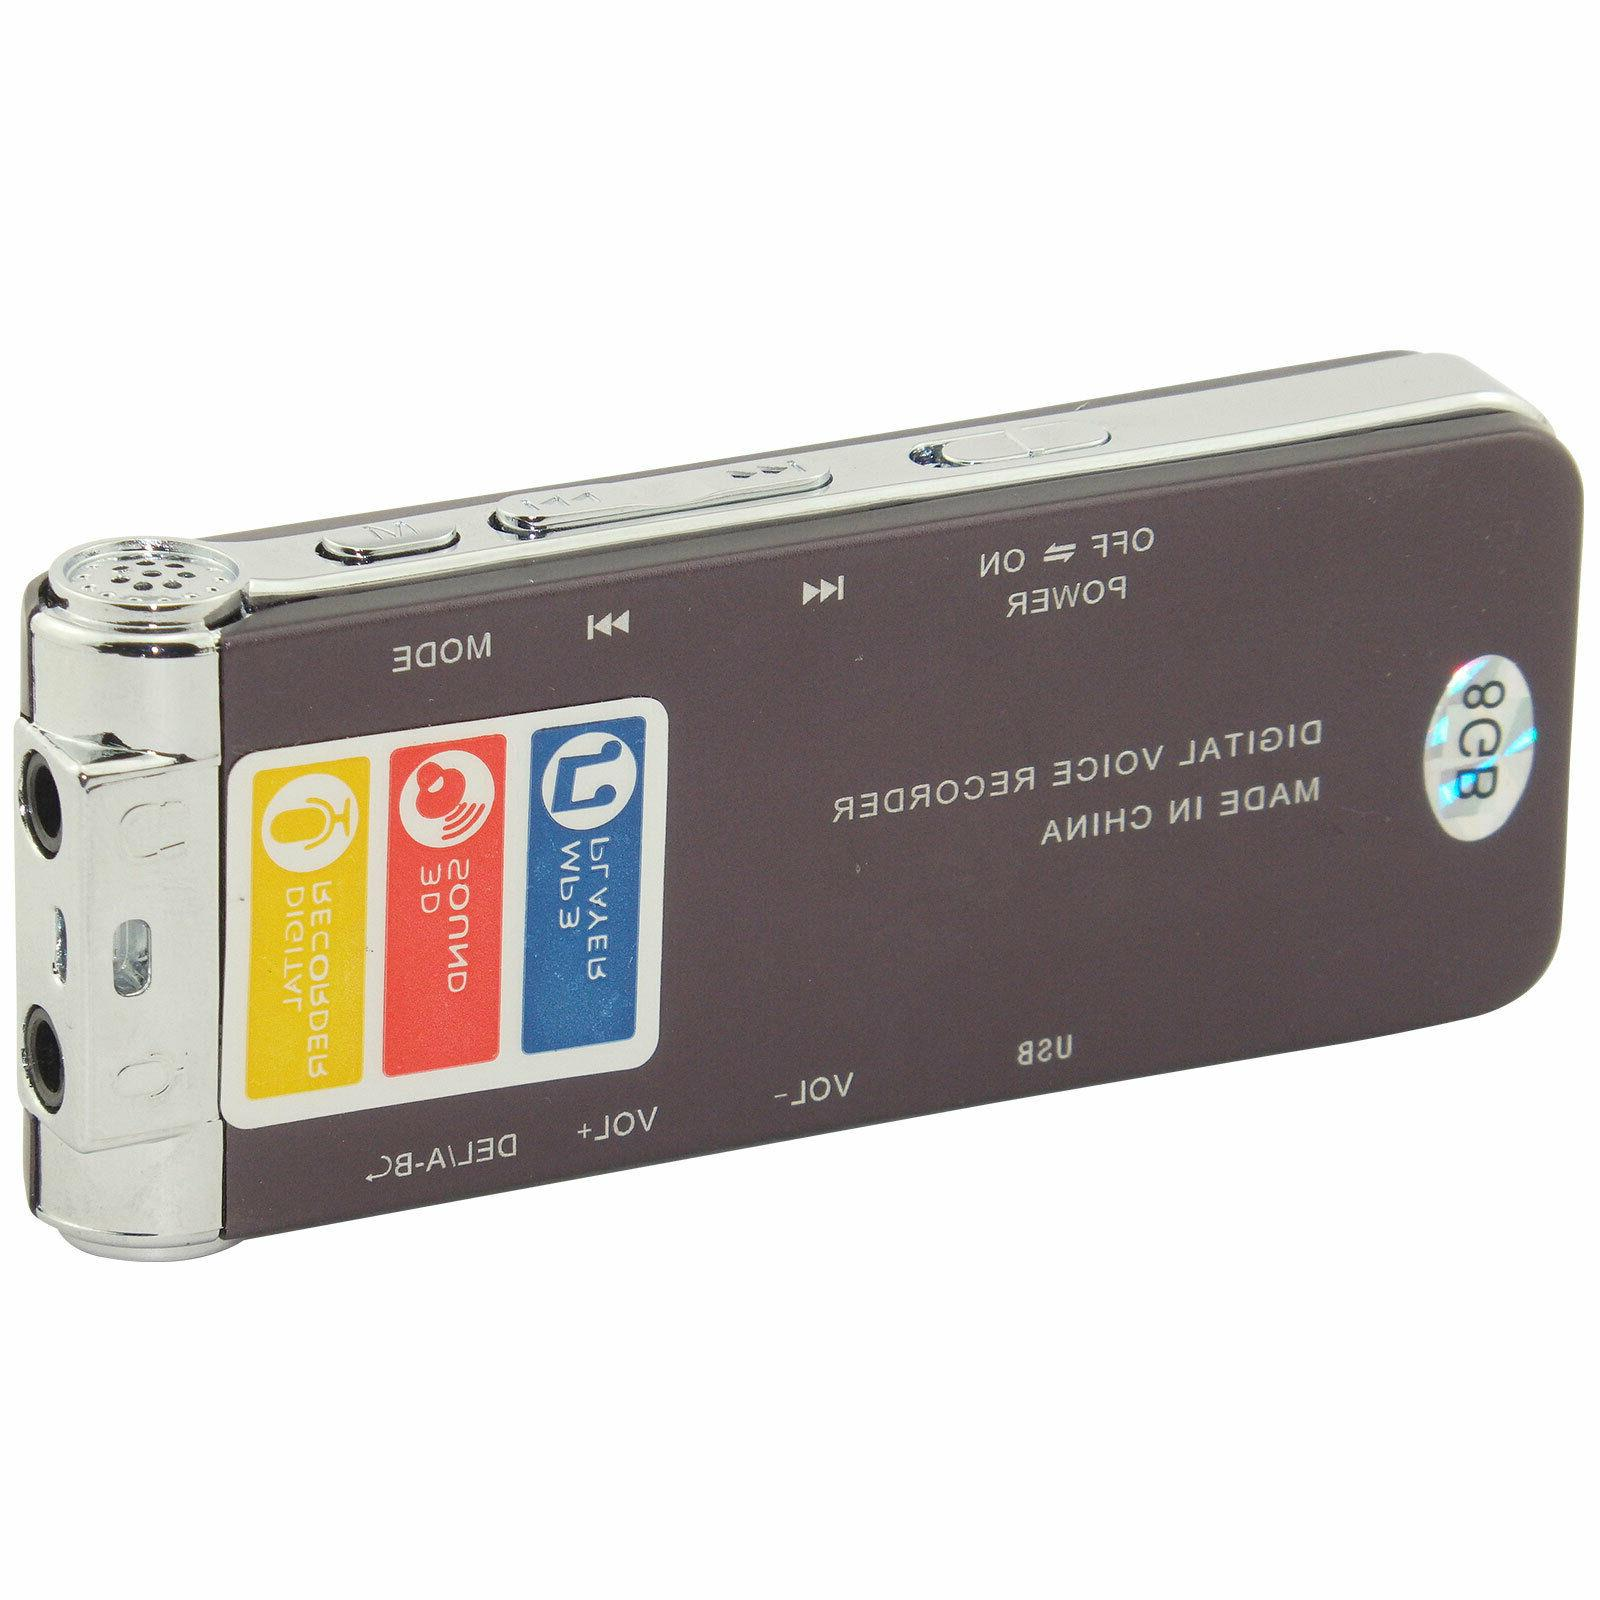 8GB USB Digital Sound Voice Recorder Dictaphone MP3